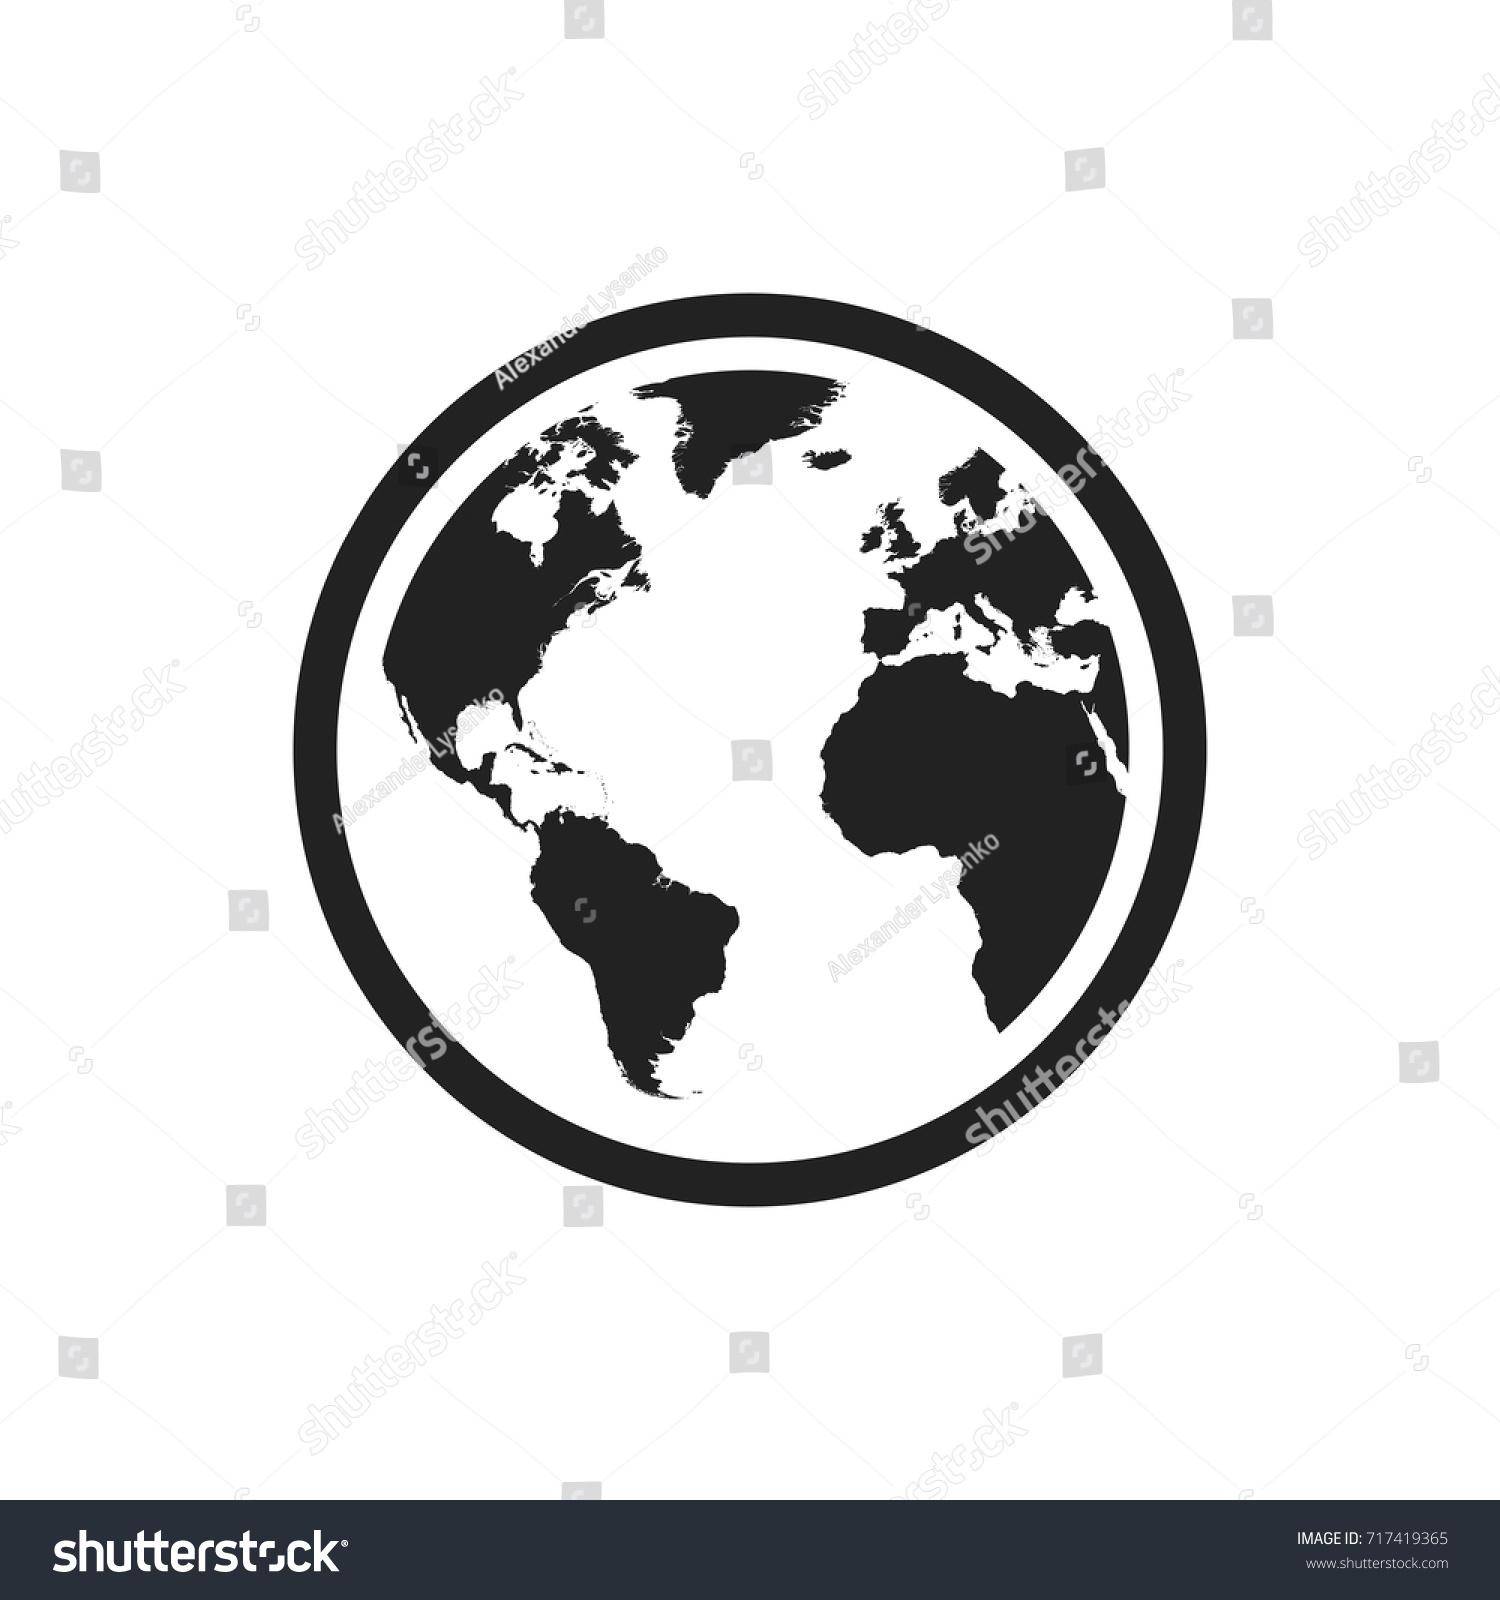 Globe world map vector icon round vectores en stock 717419365 globe world map vector icon round vectores en stock 717419365 shutterstock gumiabroncs Gallery